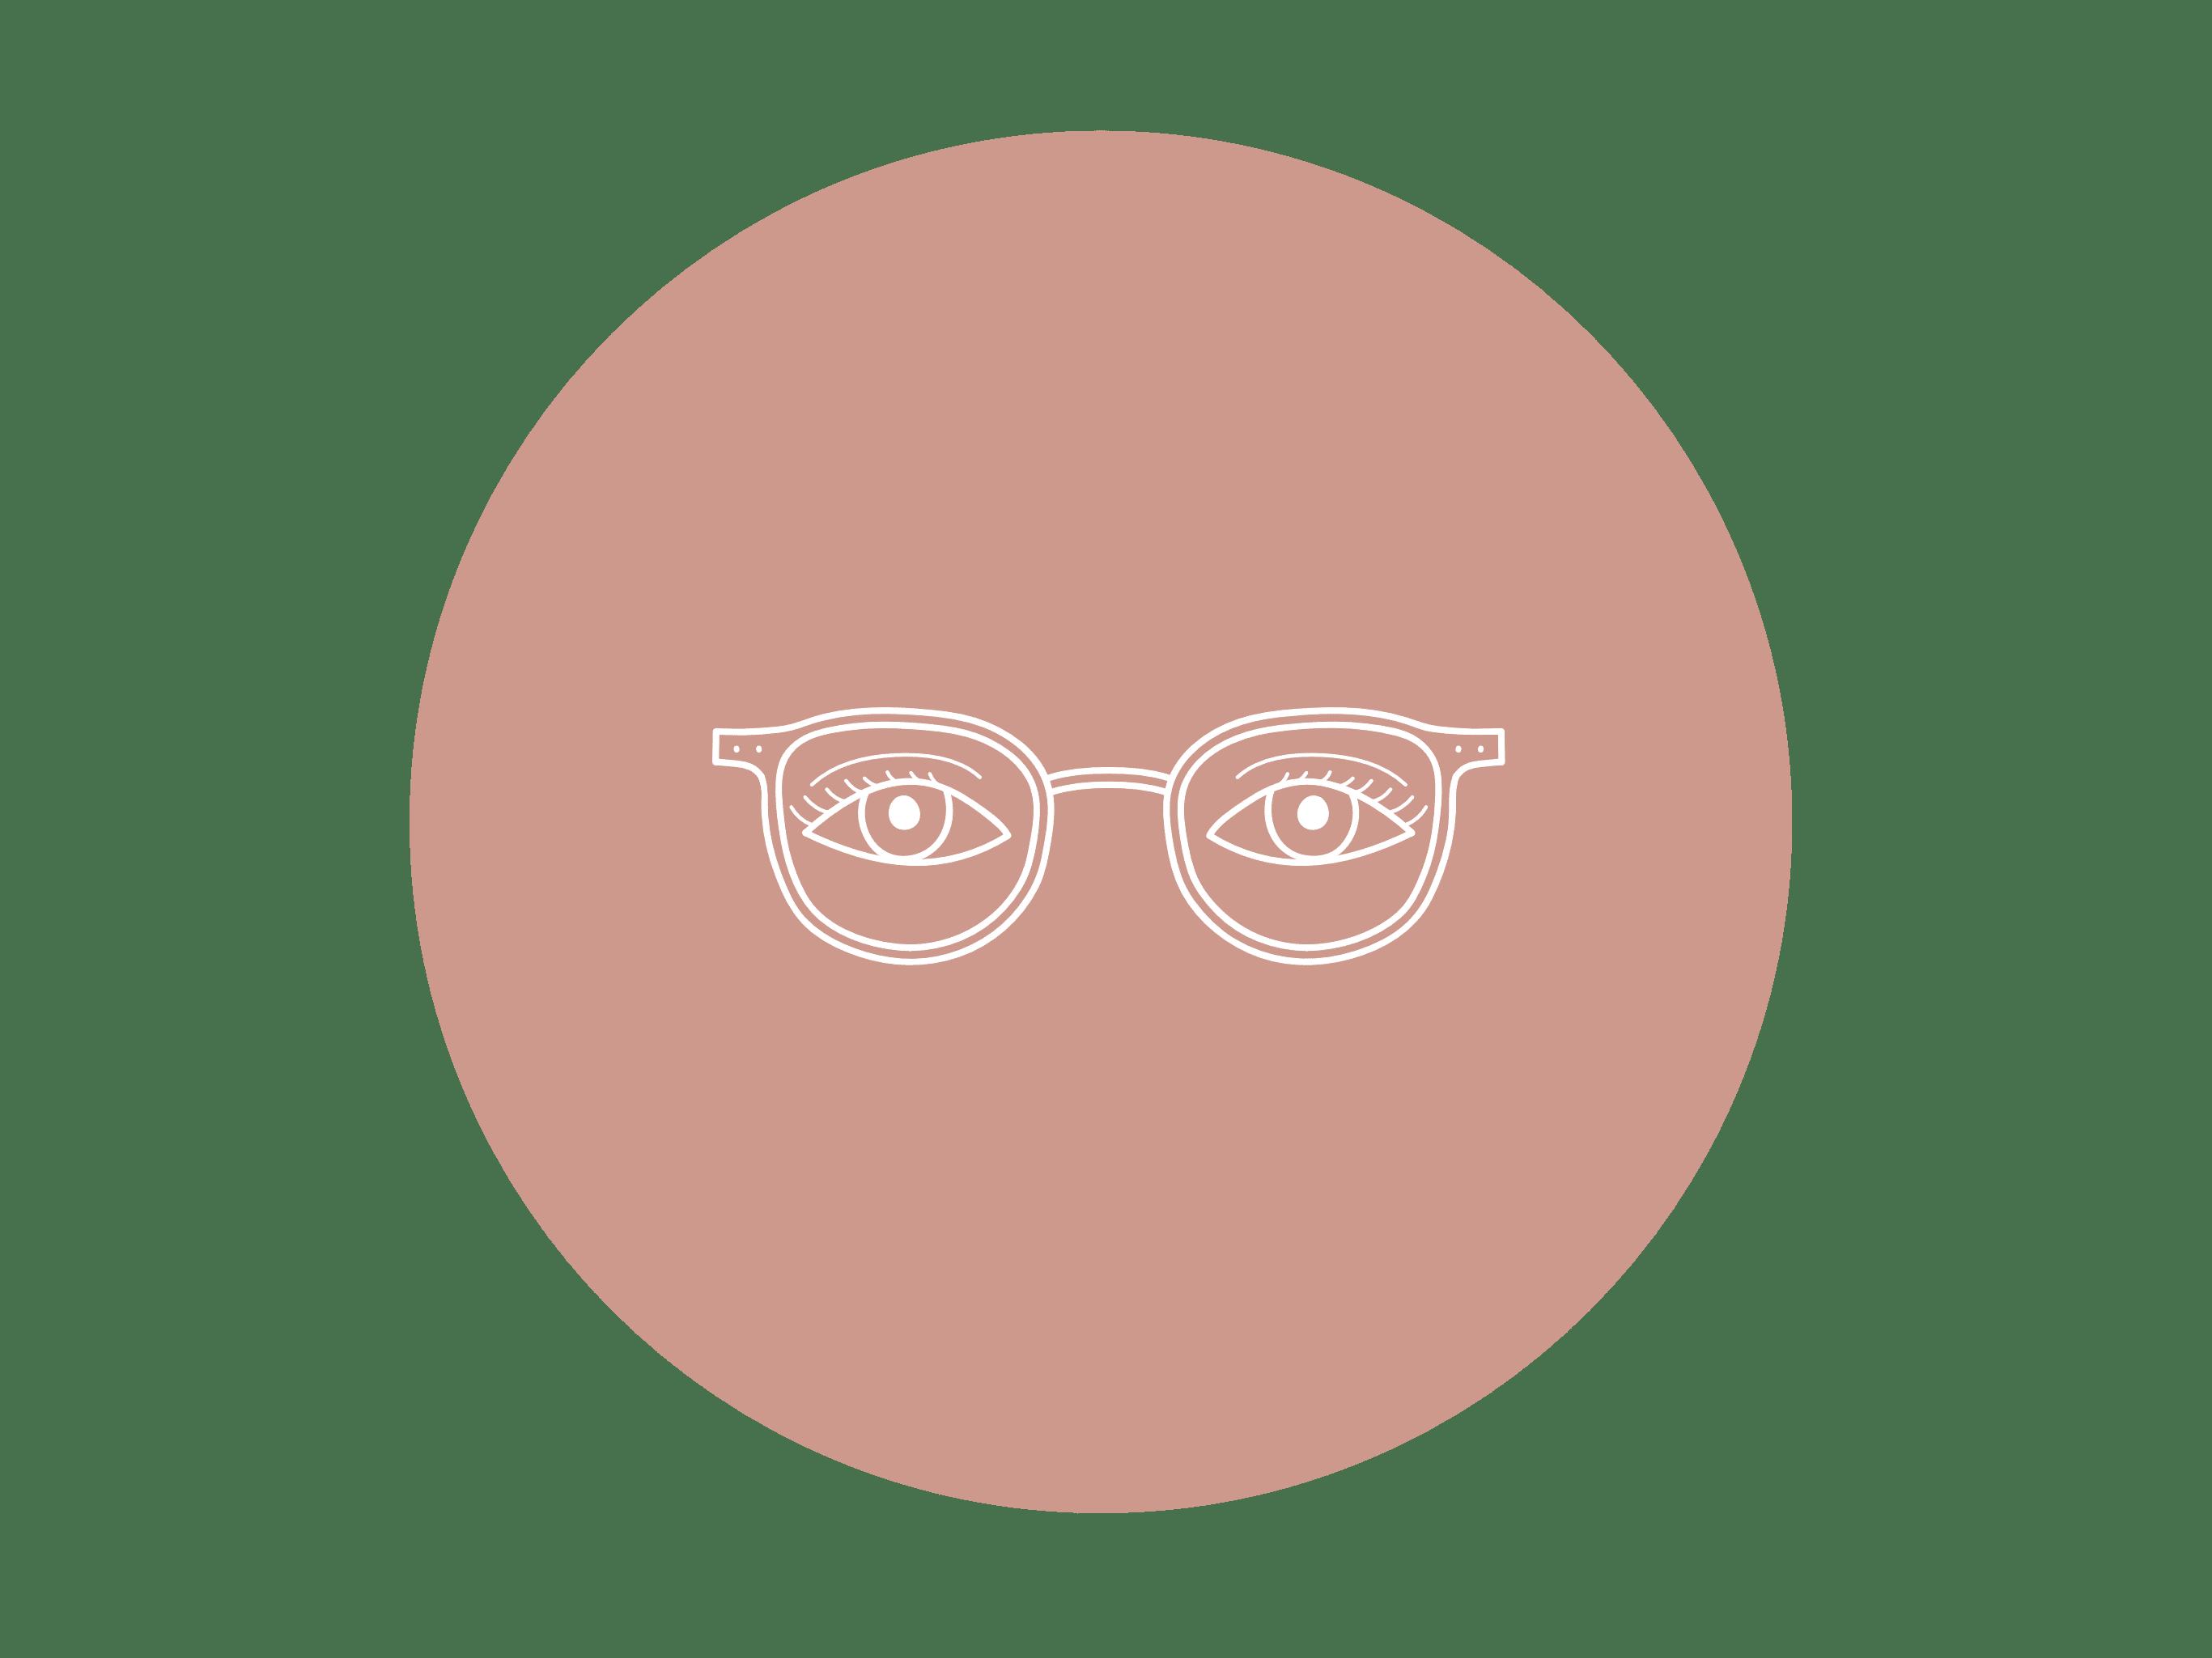 icone lunettes sur fond rose